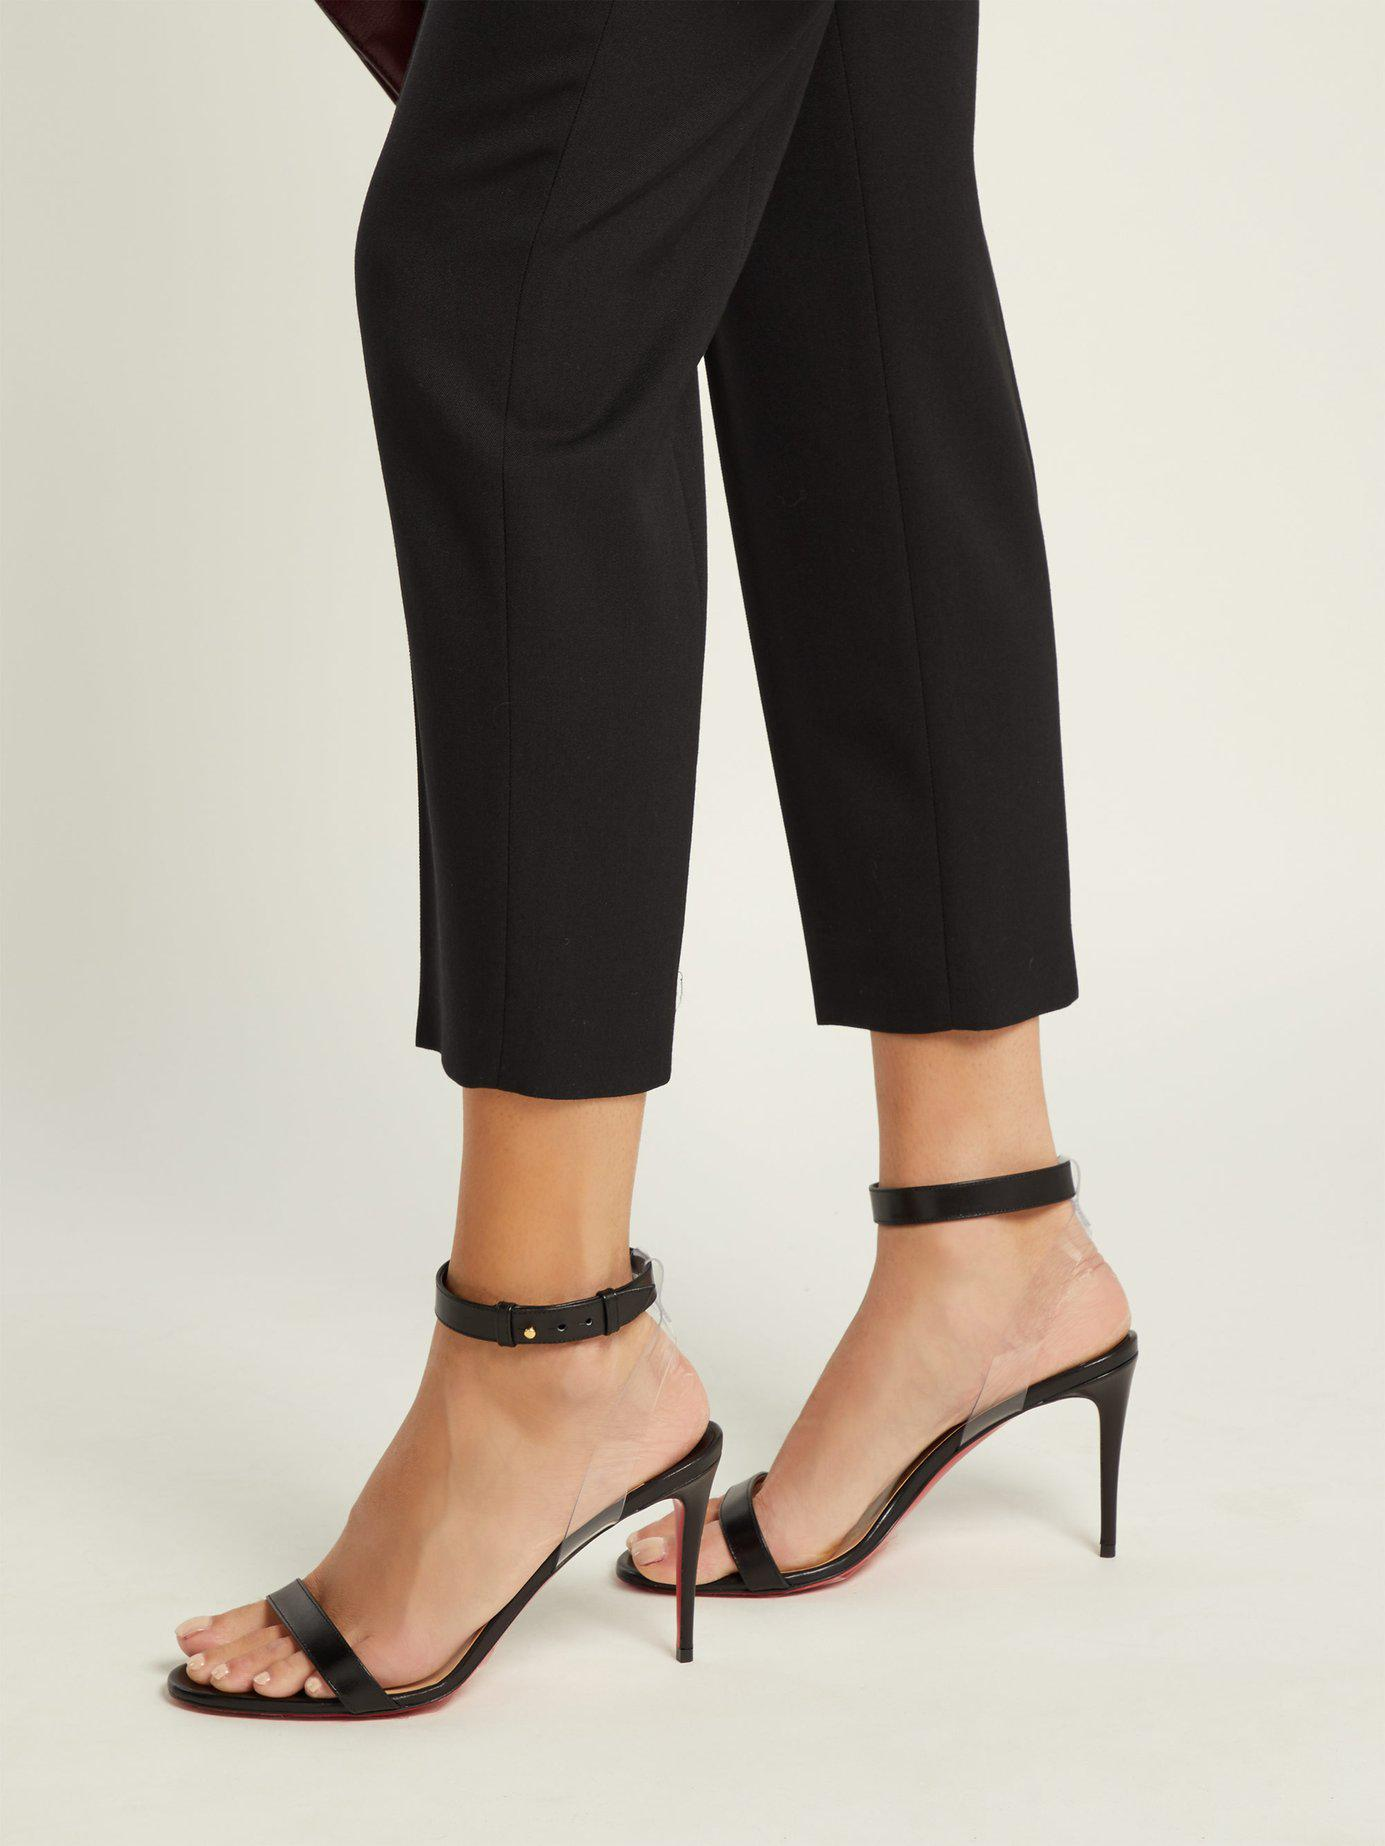 new style eb832 28261 Women's Black Jonatina 85mm Leather Sandals